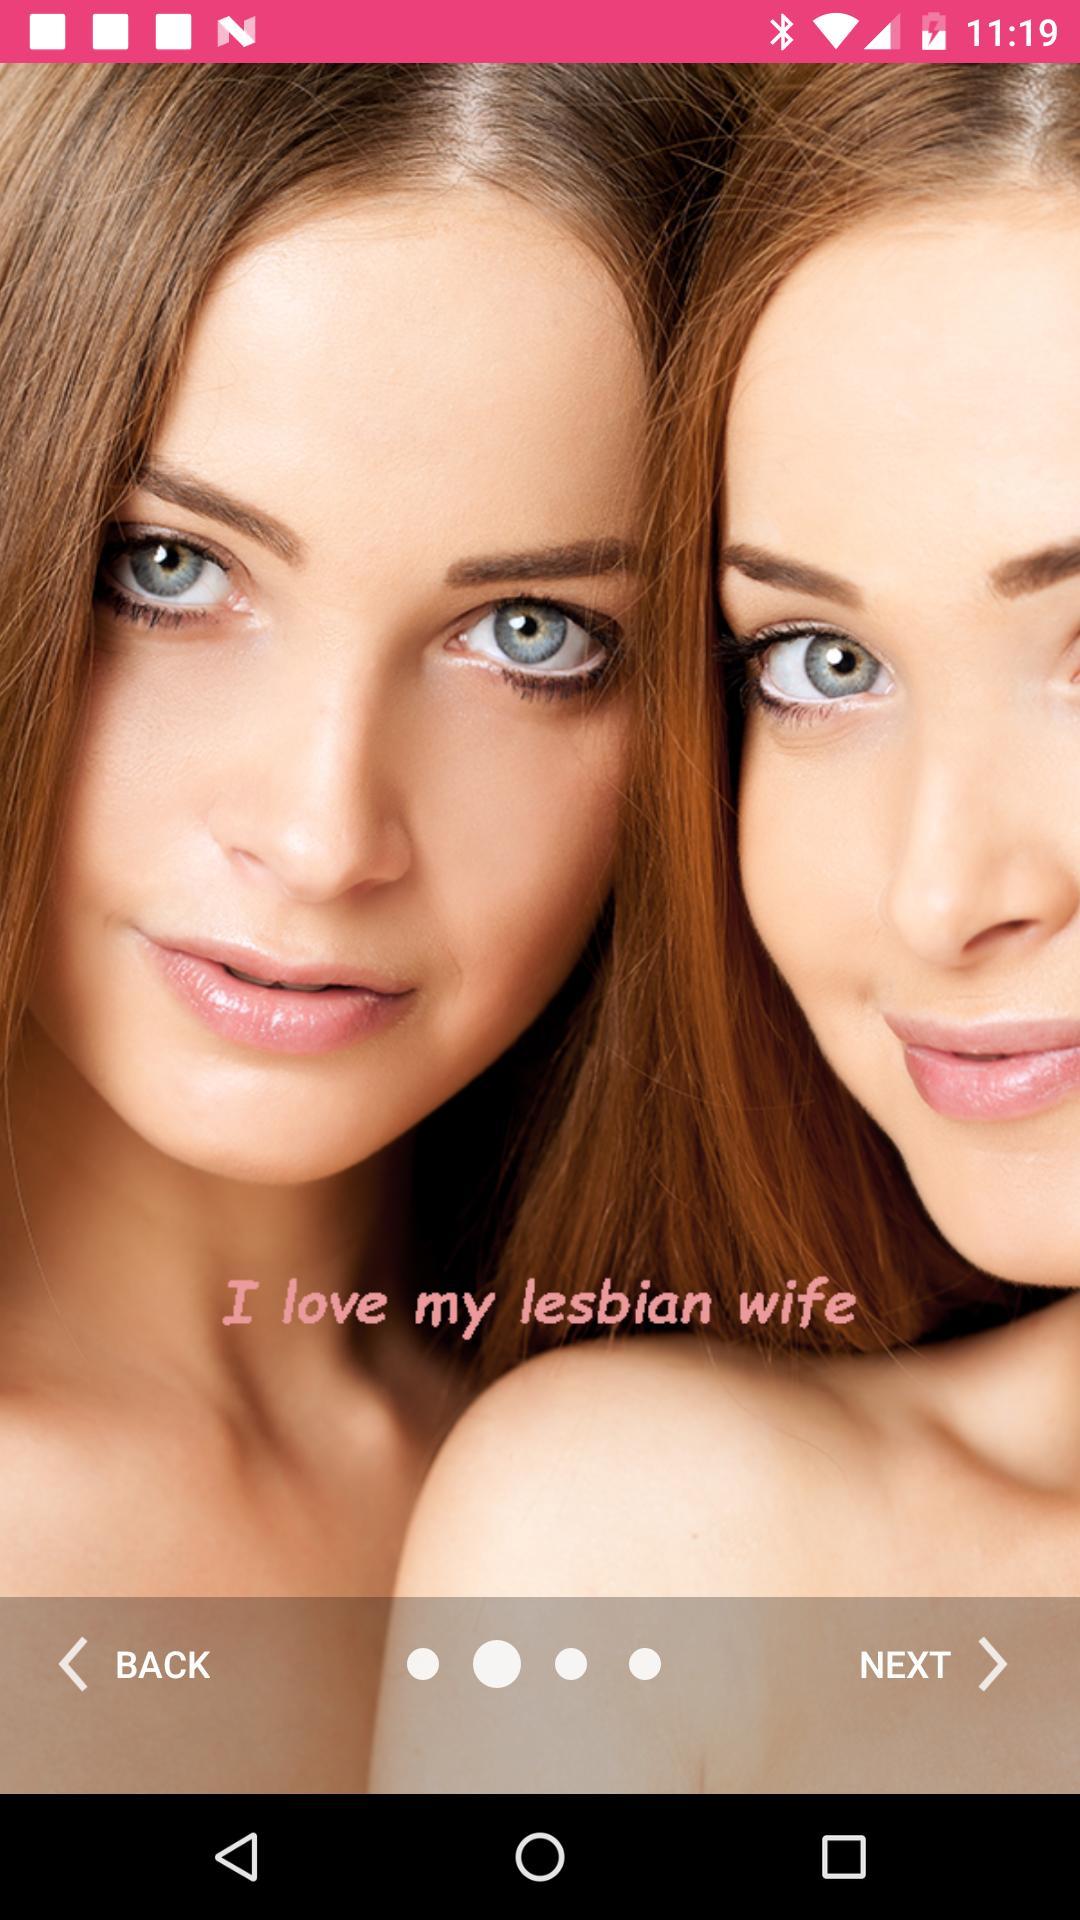 Lesbian video chat